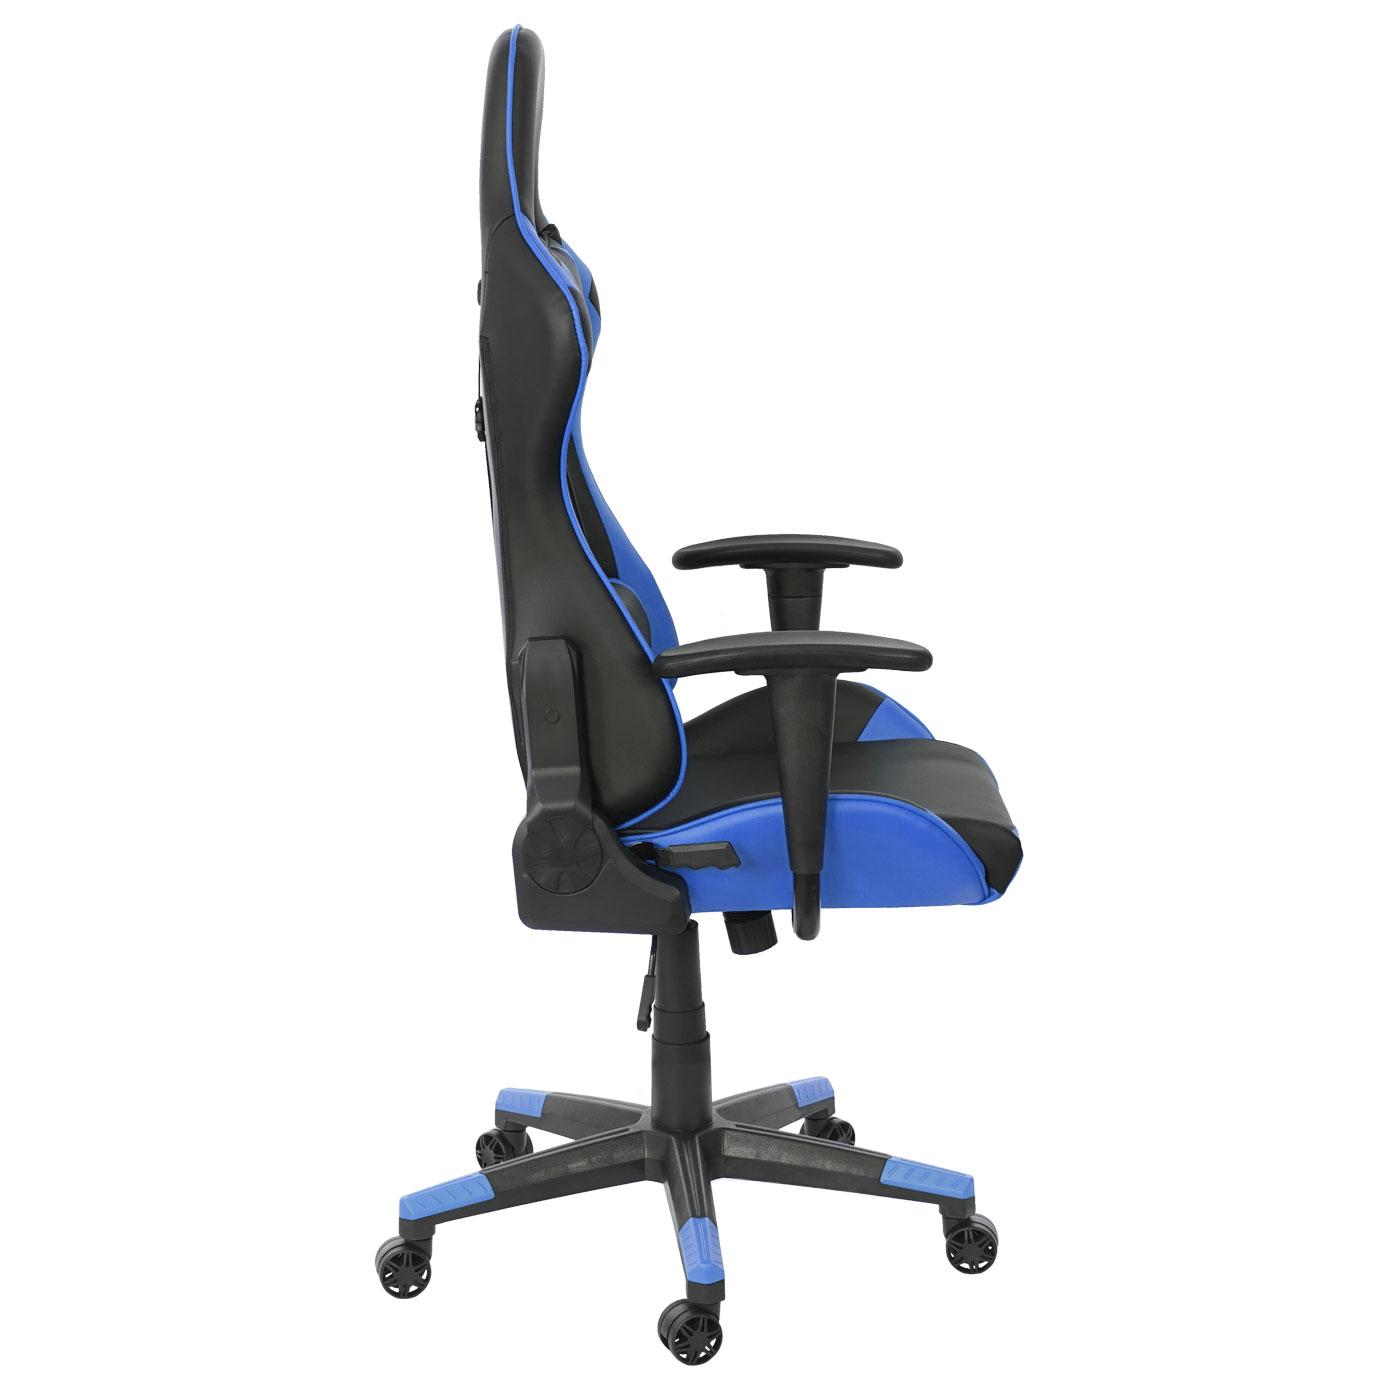 Gamingstuhl Bürostuhl HWC-D25 150kg belastbar Kunstleder schwarz//grau